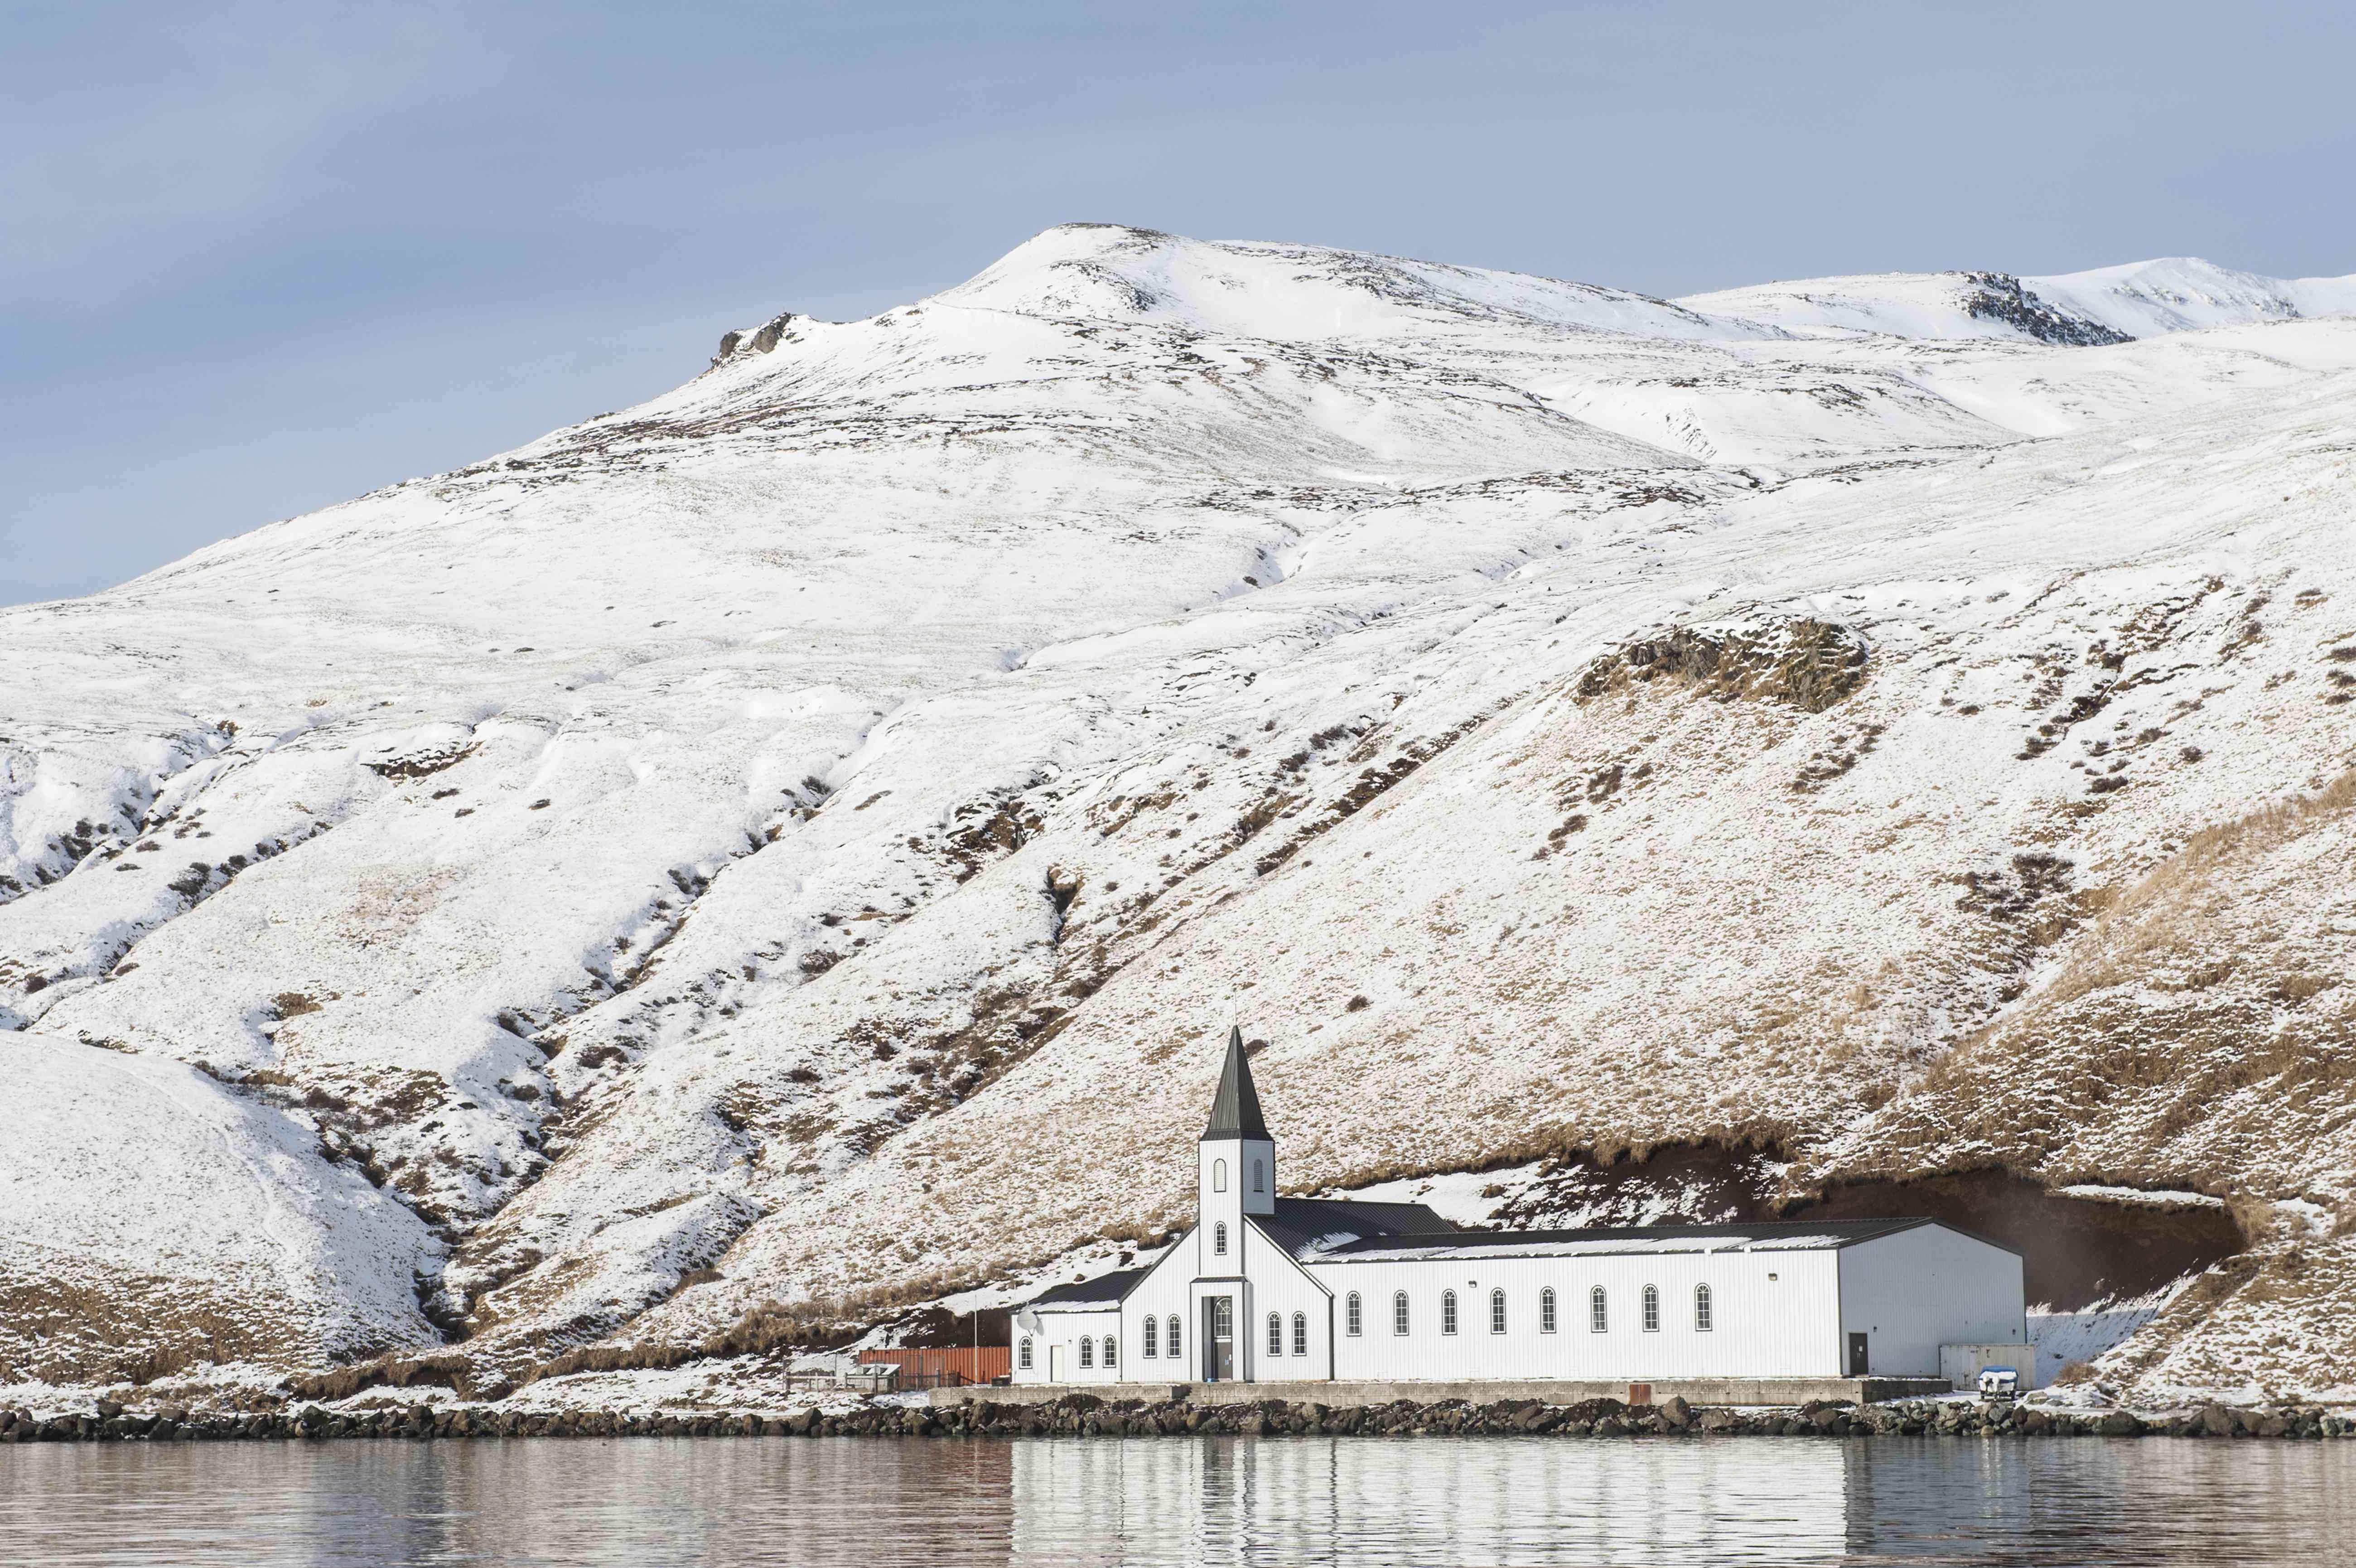 Church in front of snowy mountain in Akutan village